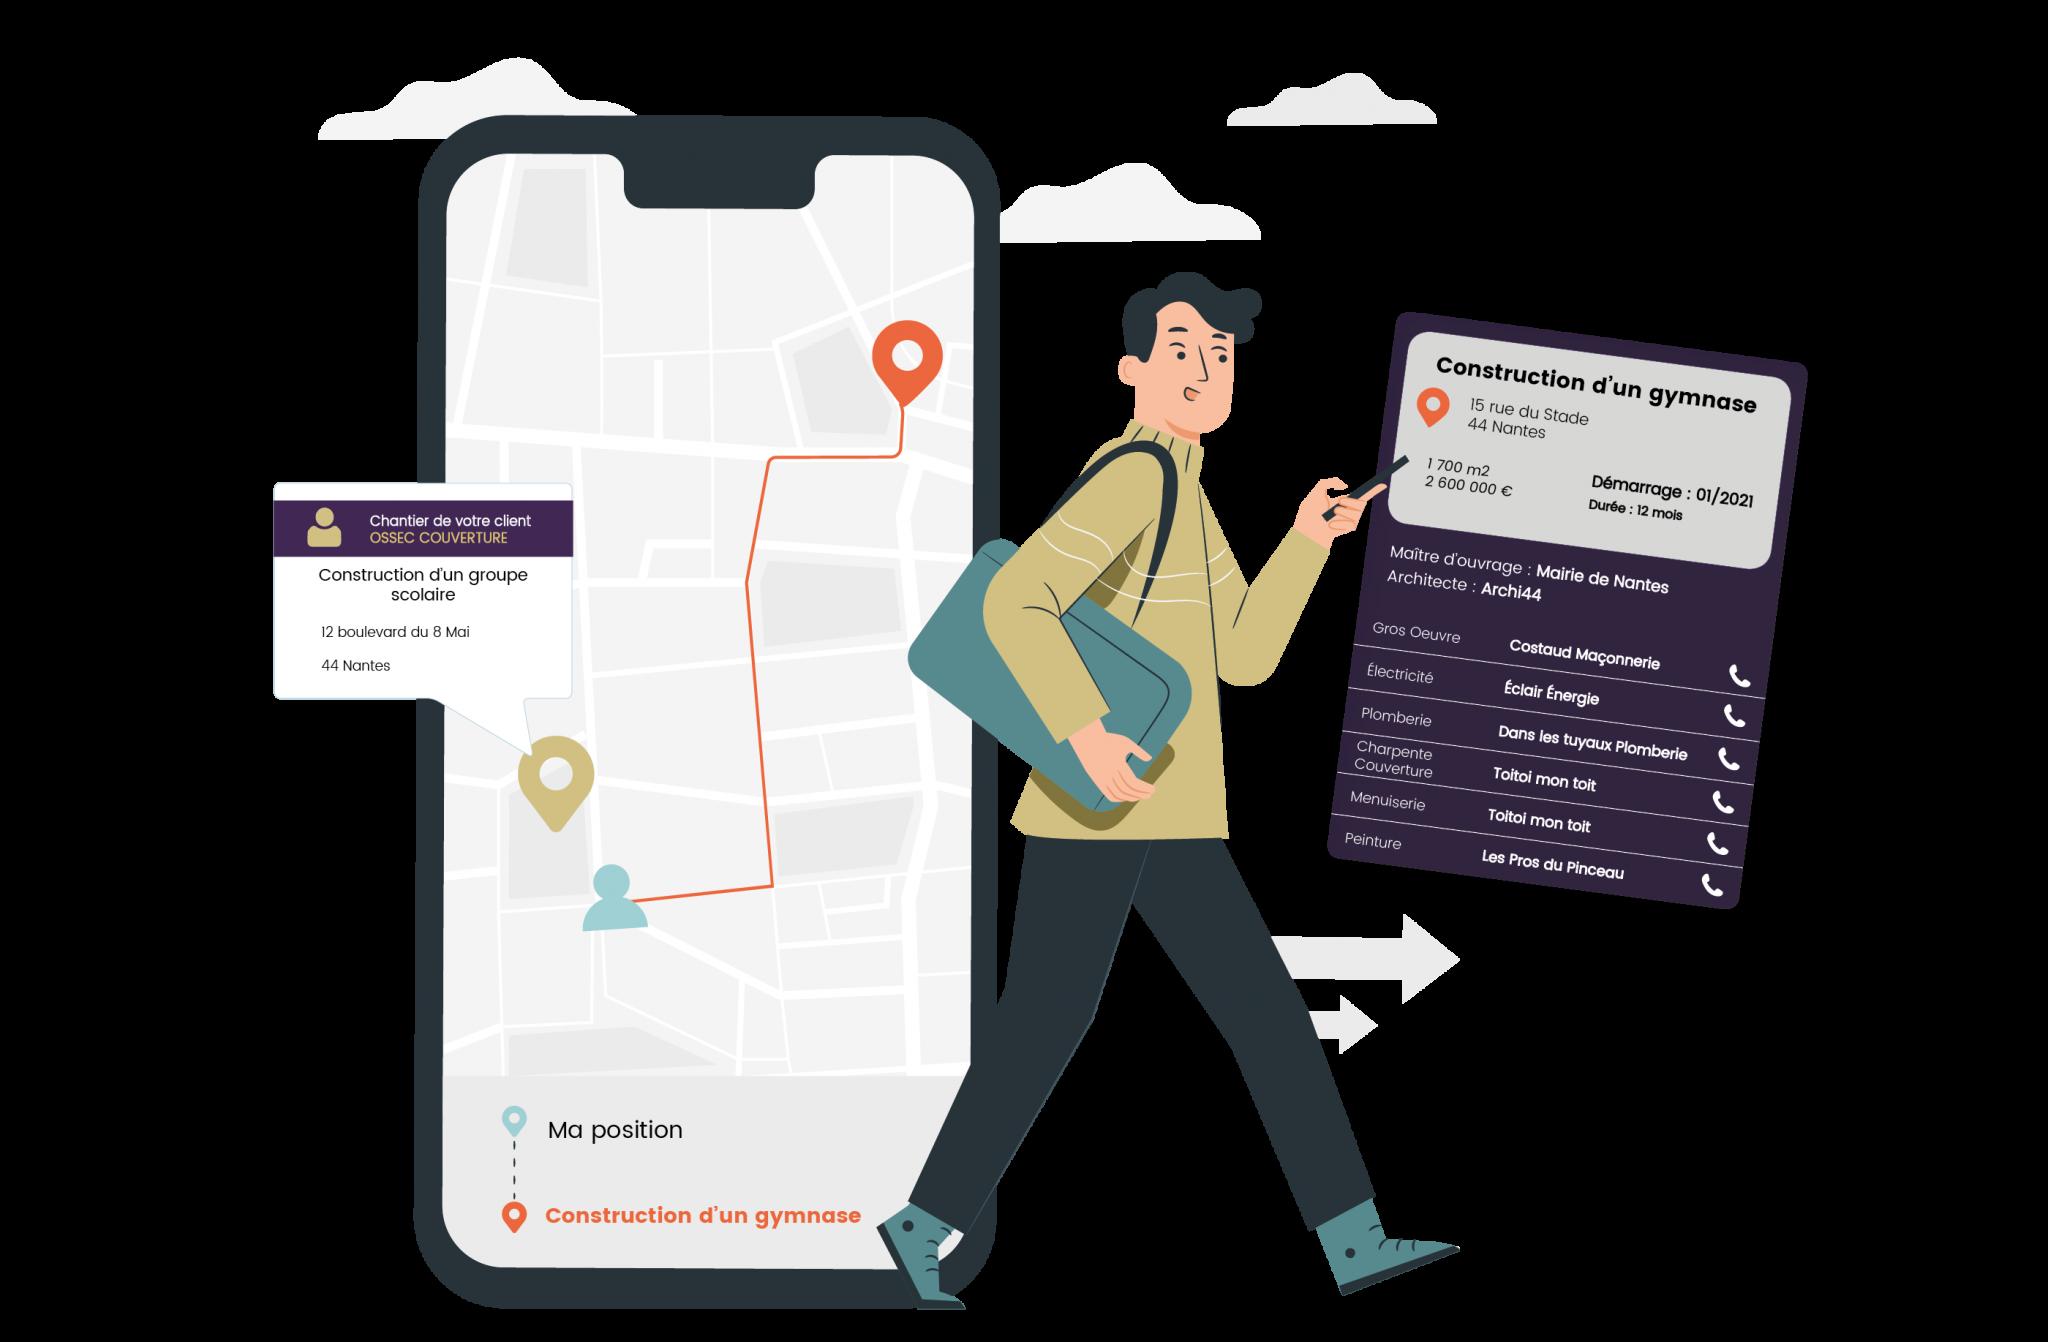 appli-mobile-geolocalisation